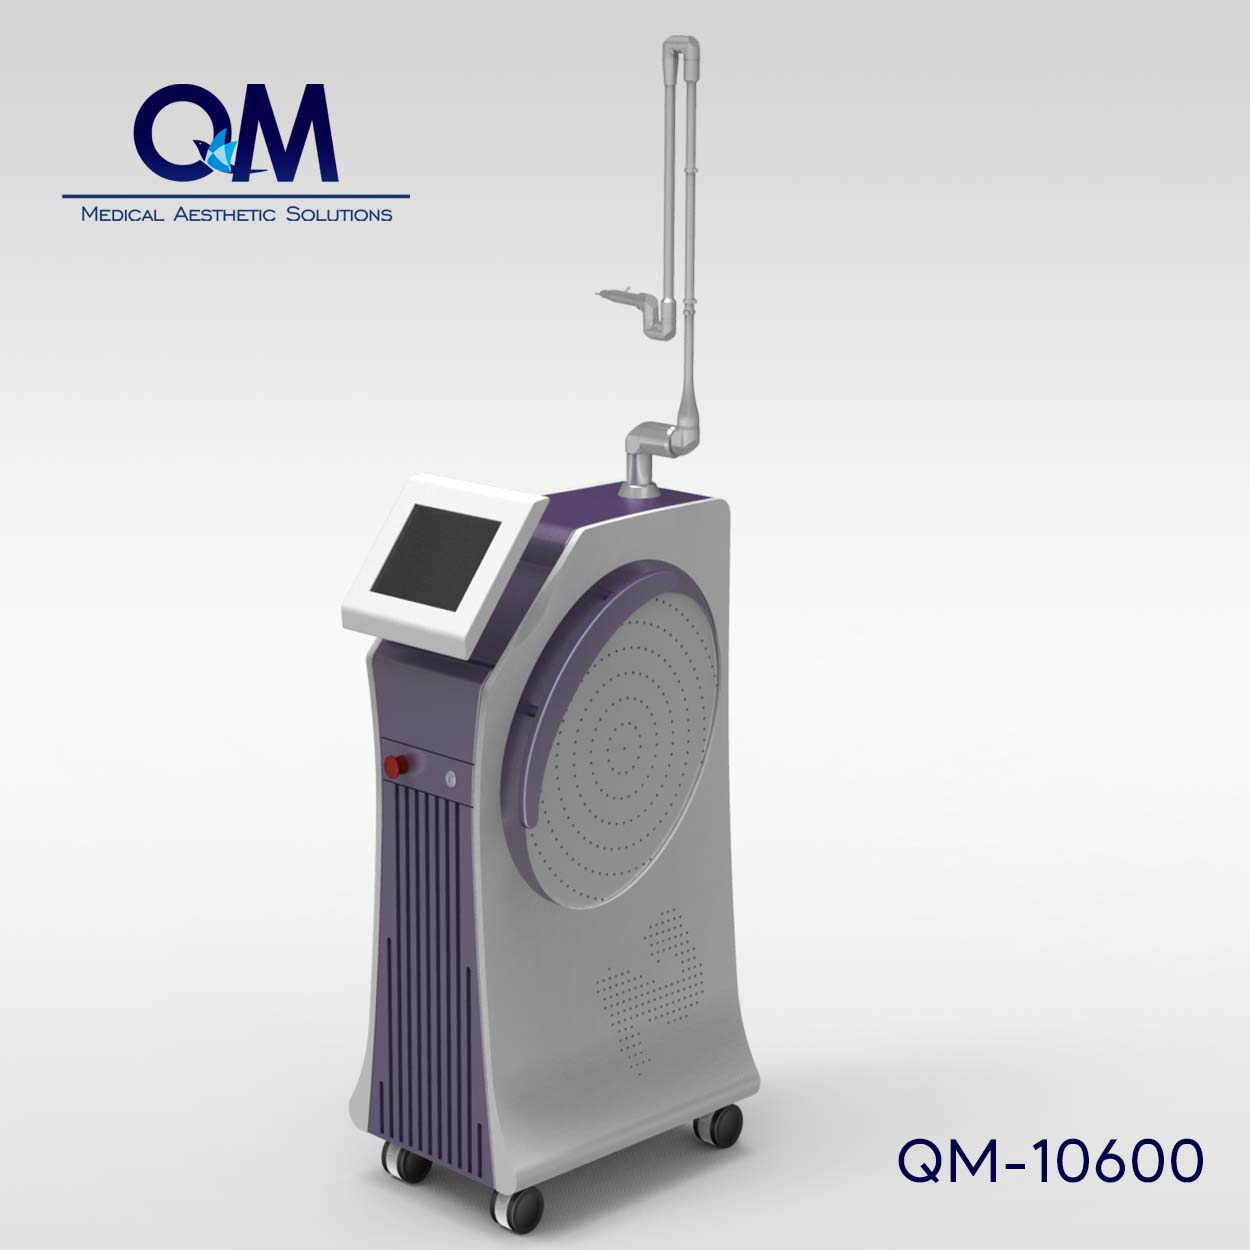 QM-10600